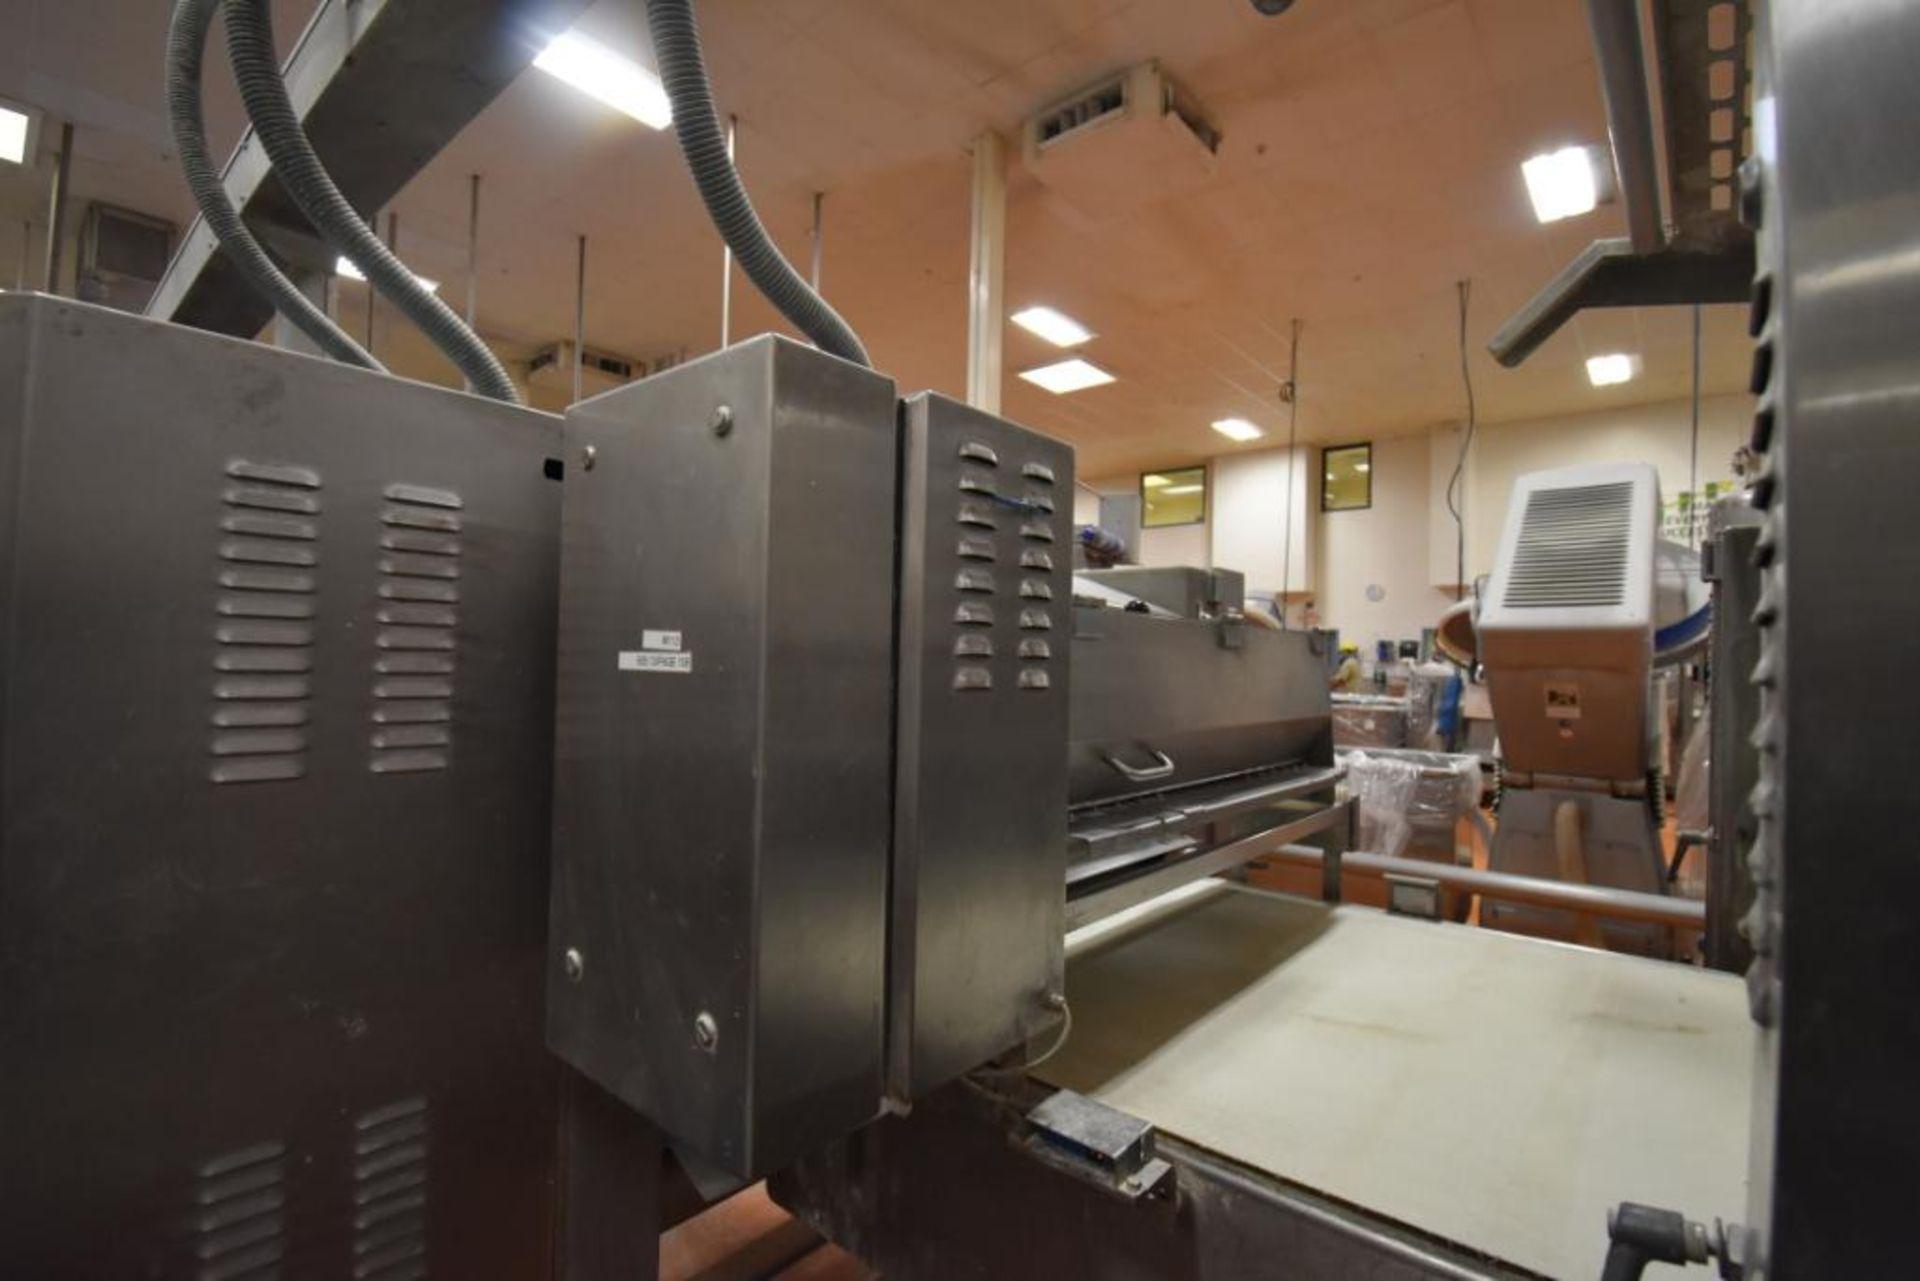 2007 Fritsch Laminator 3000 dough line - Image 155 of 280